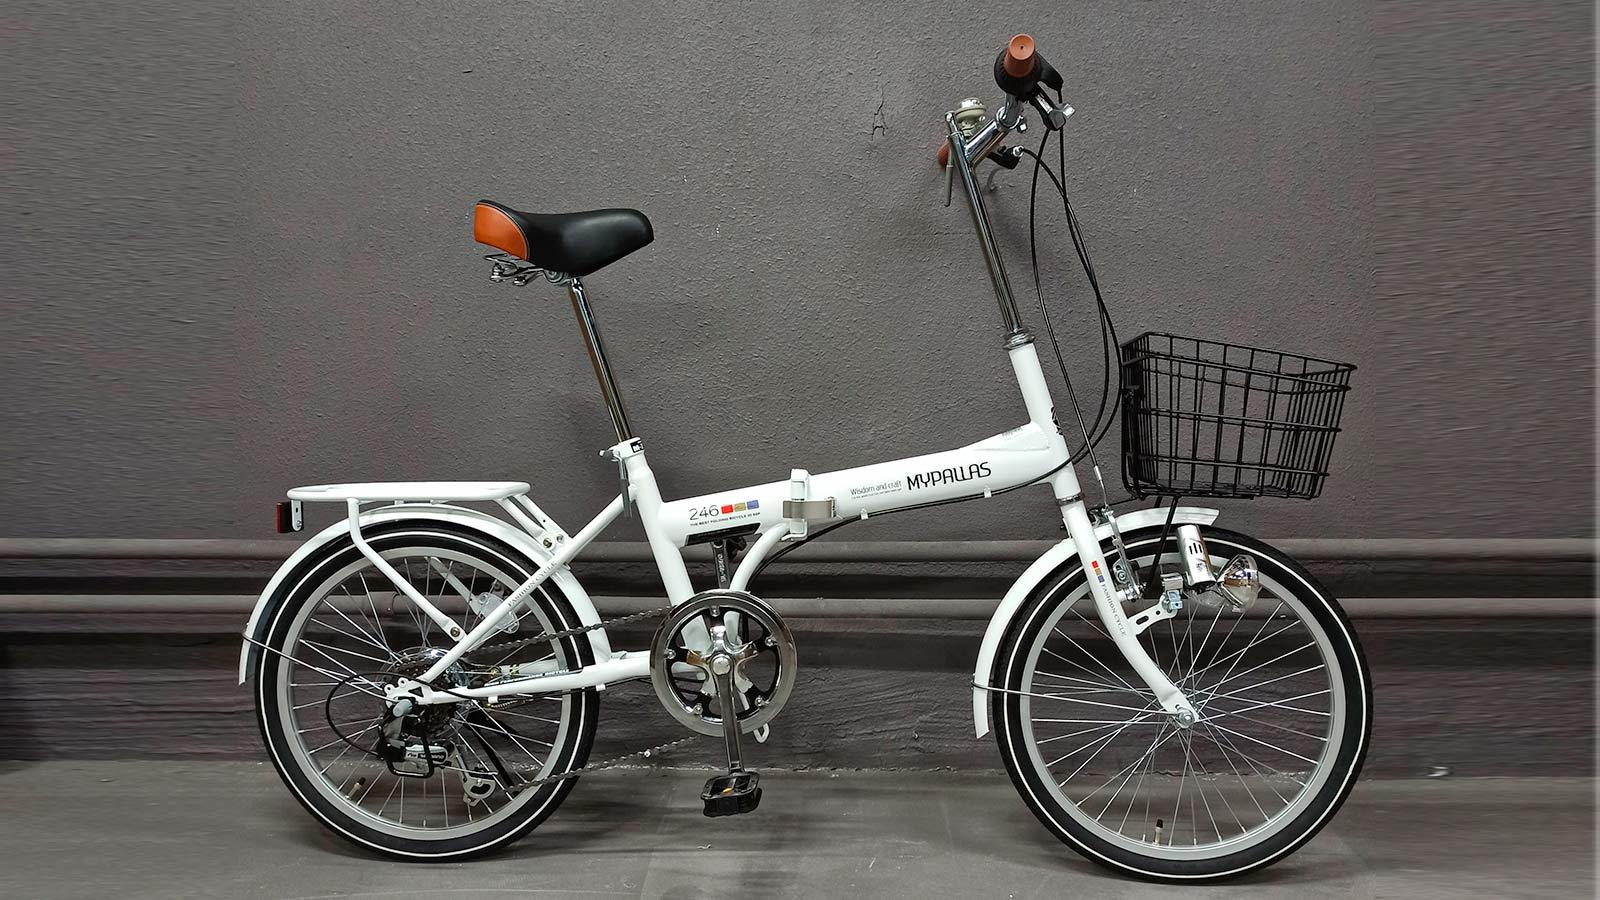 складной велосипед взрослый MyPallas M246 белый